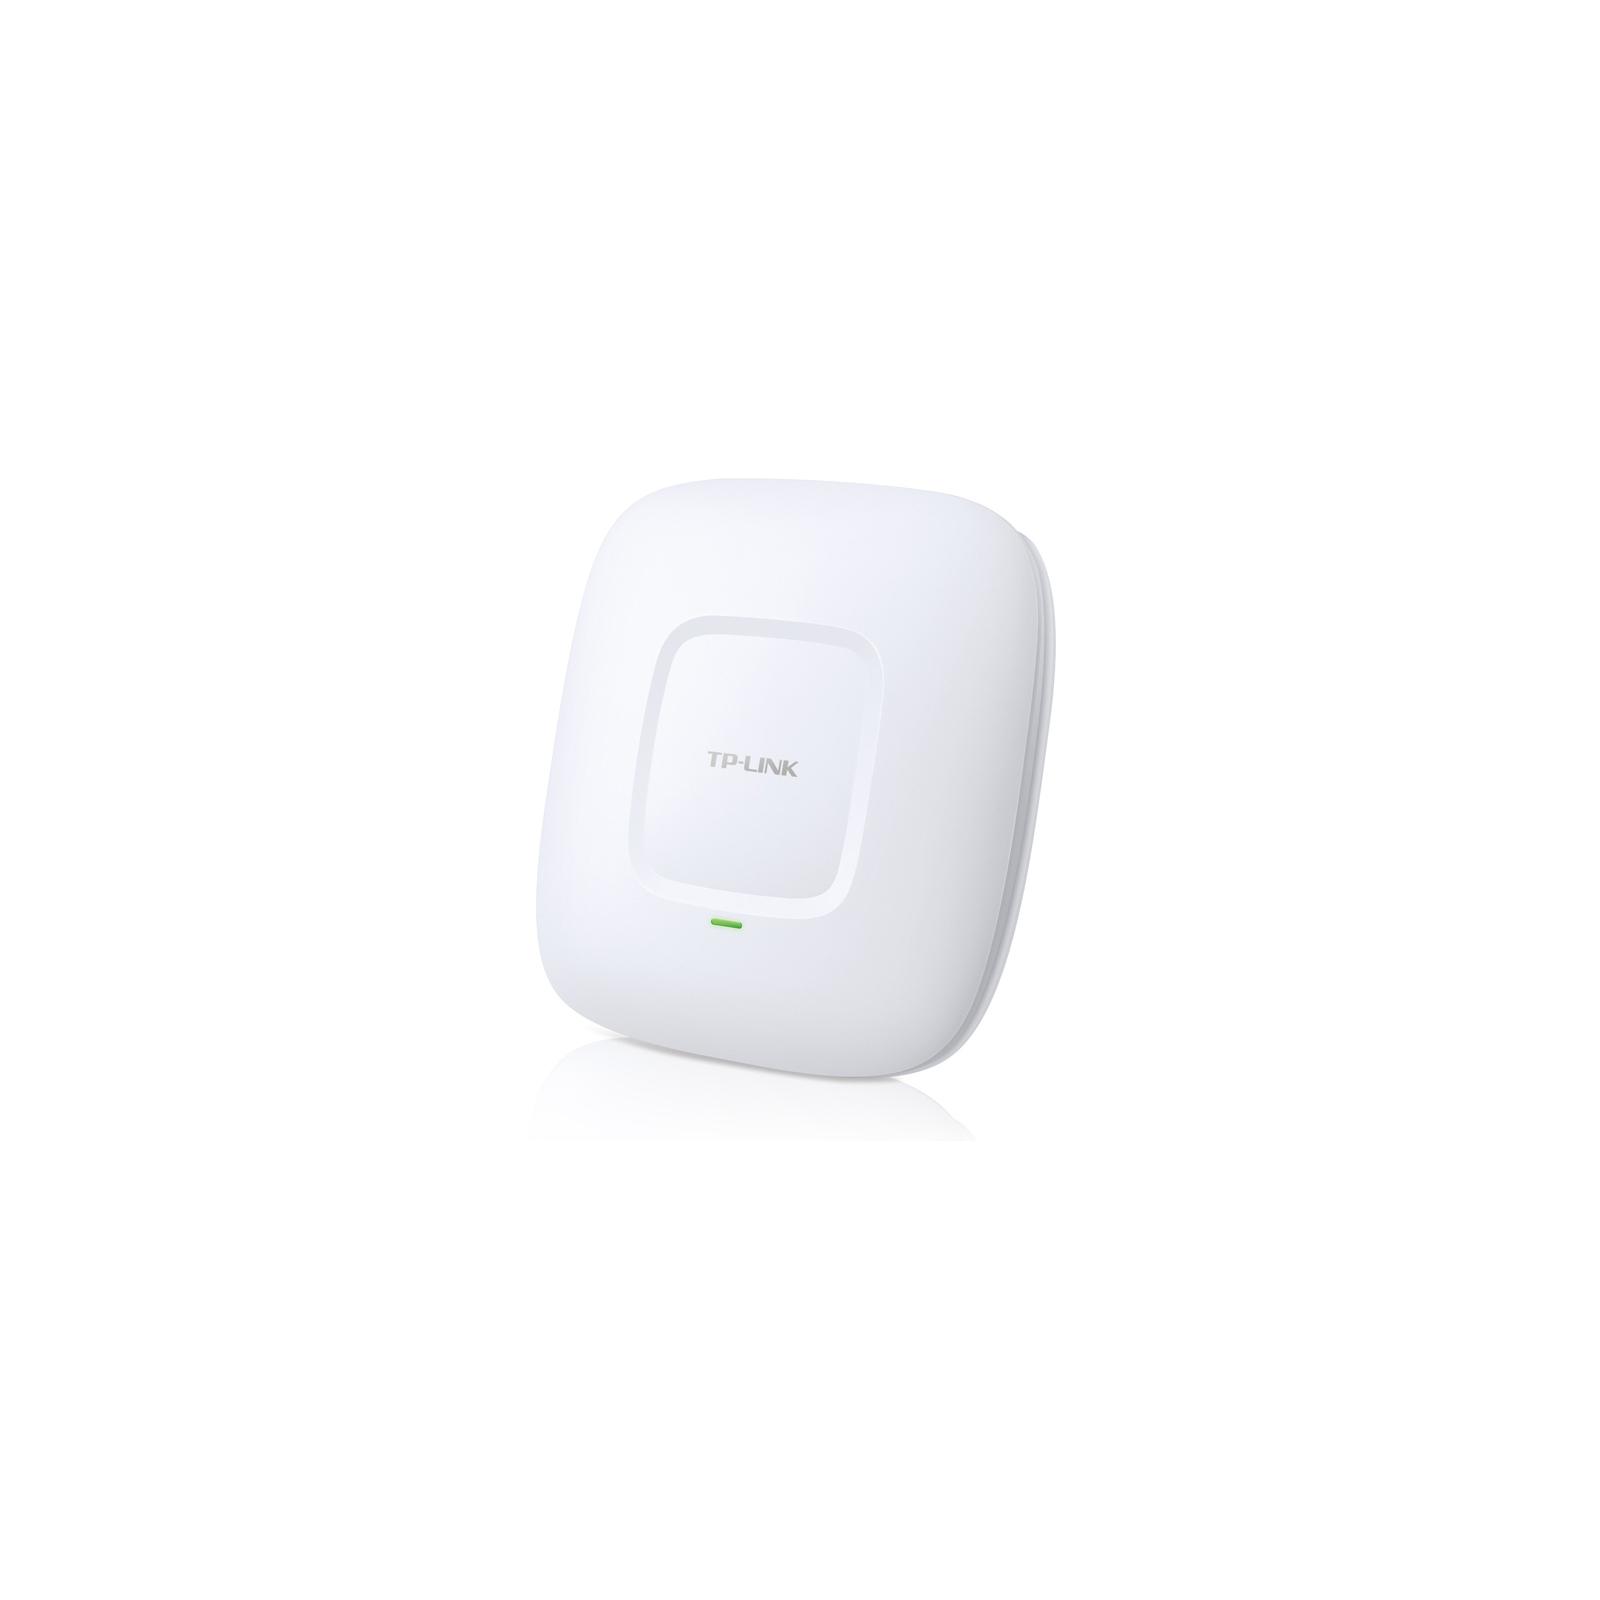 Точка доступа Wi-Fi TP-Link EAP220 изображение 3